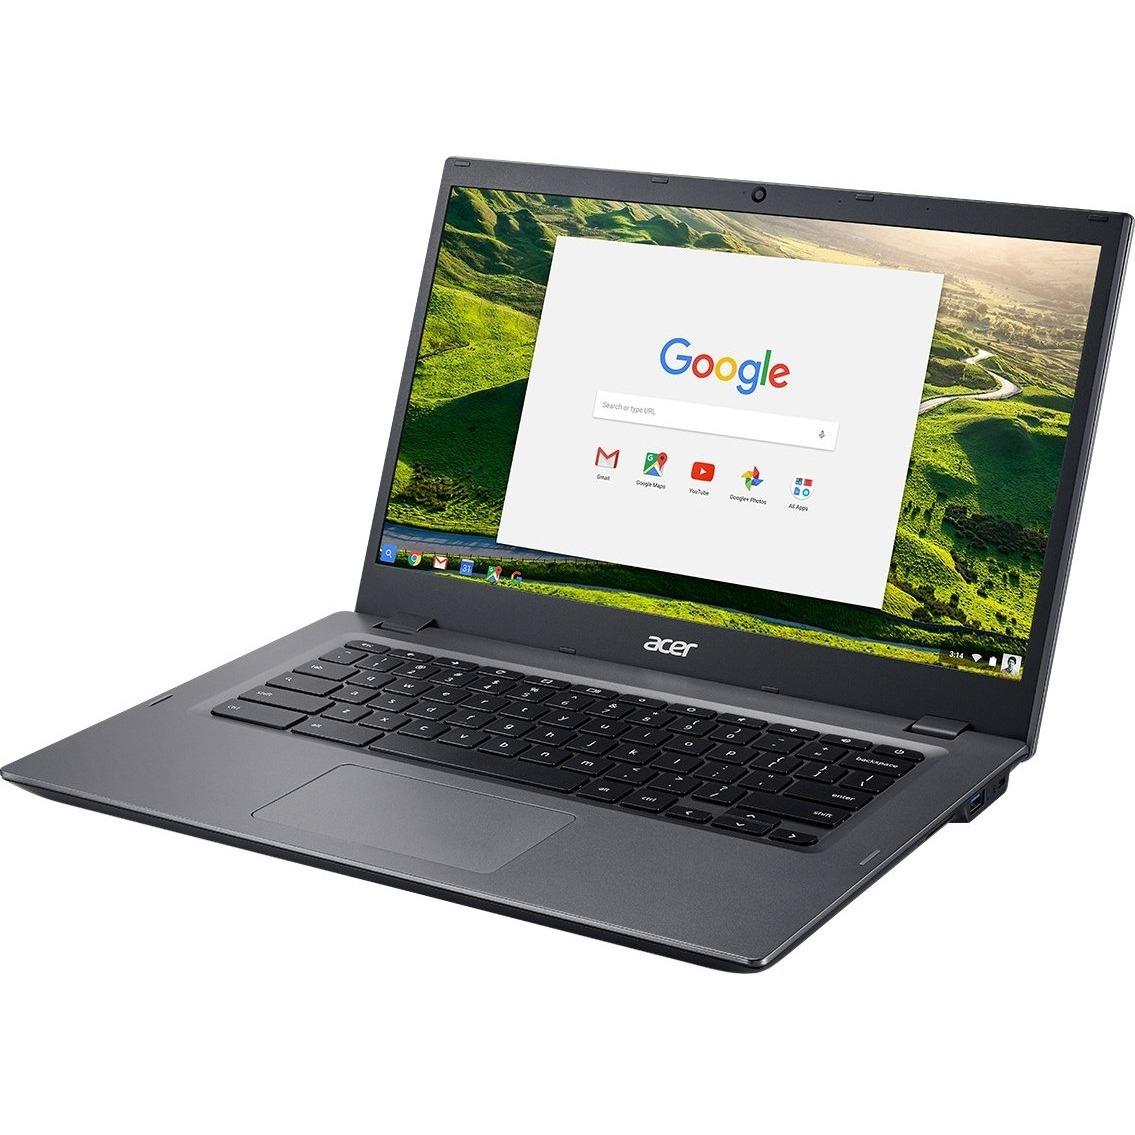 Acer CP5-471-C146 35.6 cm 14inch LCD Chromebook - Intel Celeron 3855U Dual-core 2 Core 1.60 GHz